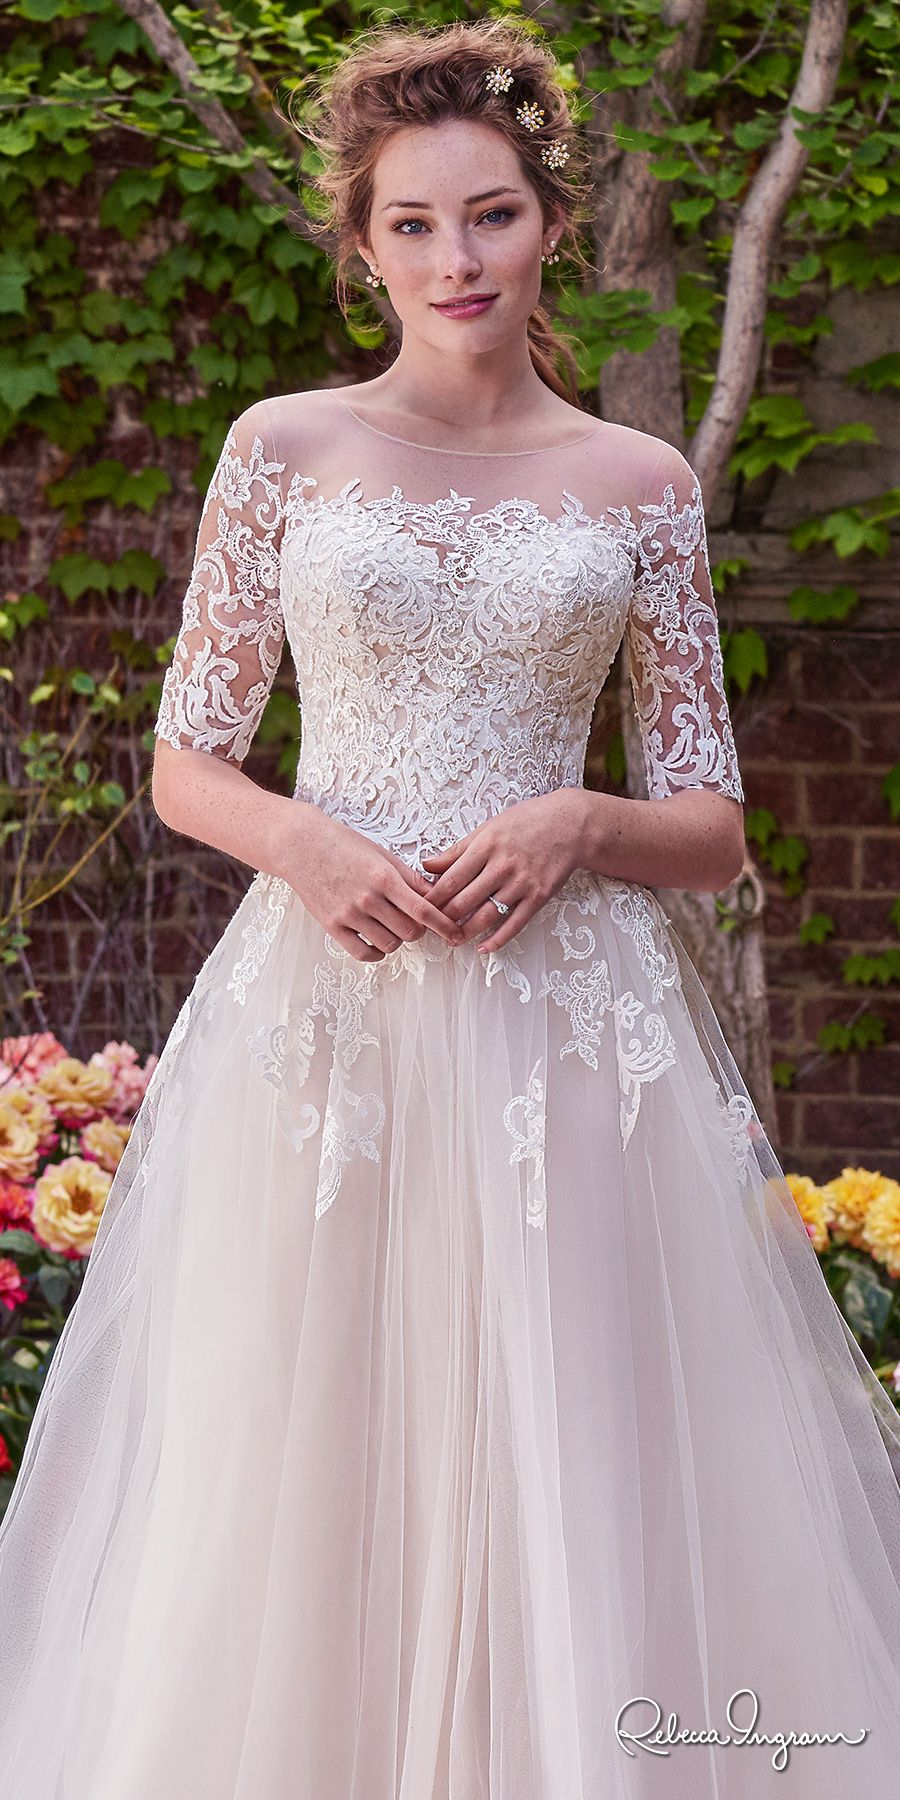 a4441aa1f324 rebecca ingram 2017 bridal half sleeves illusion jewel straight across  neckline heavily embellished bodice romantic princess